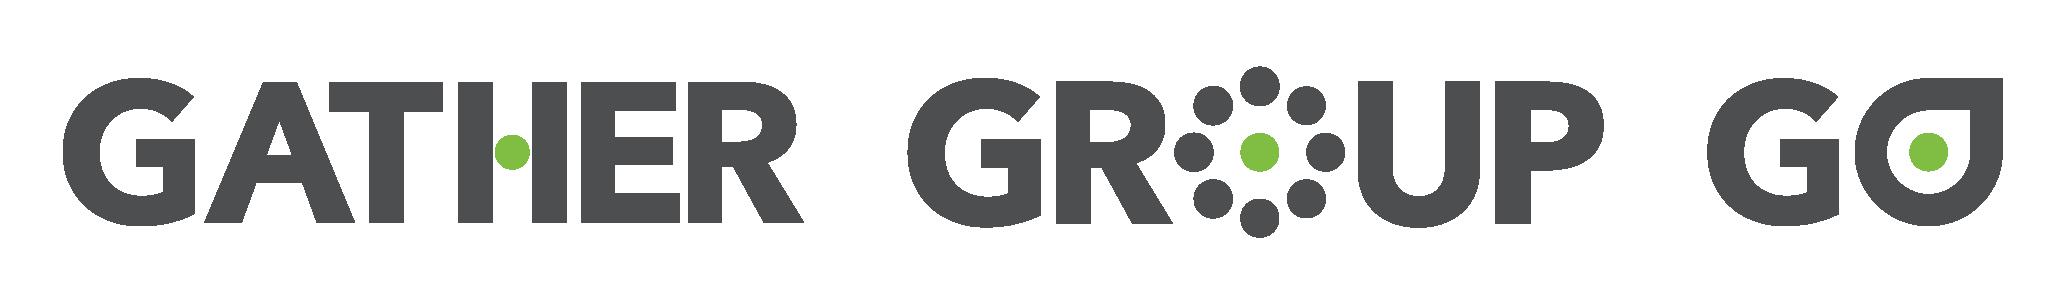 gather-group-go_horizontal-white.png